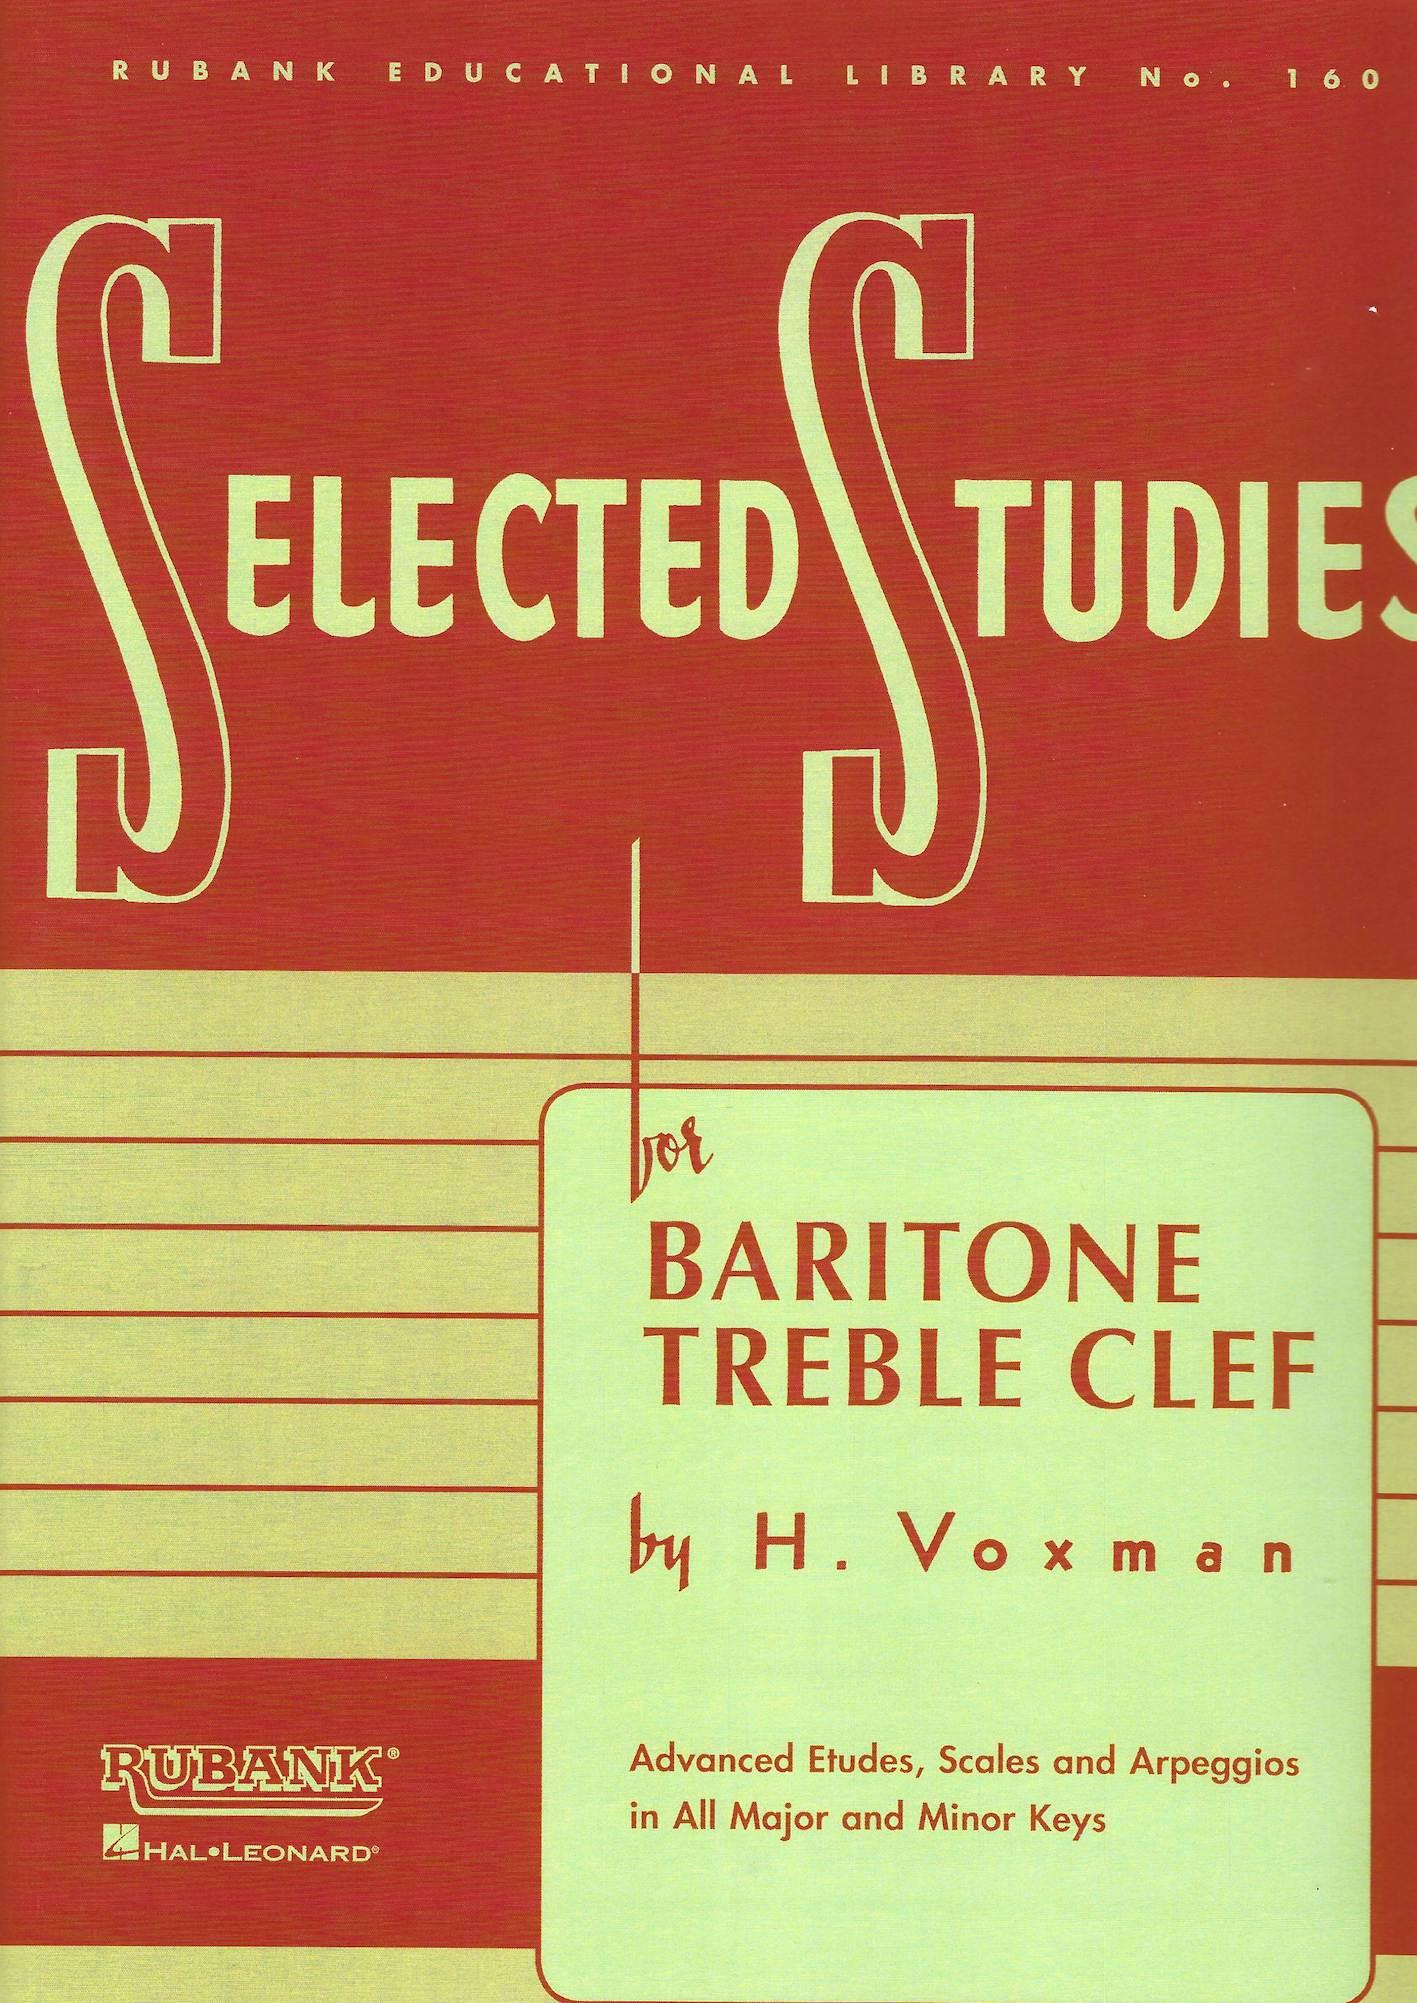 Selected Studies for Baritone/Euphonium - H. Voxman - Treble Clef version